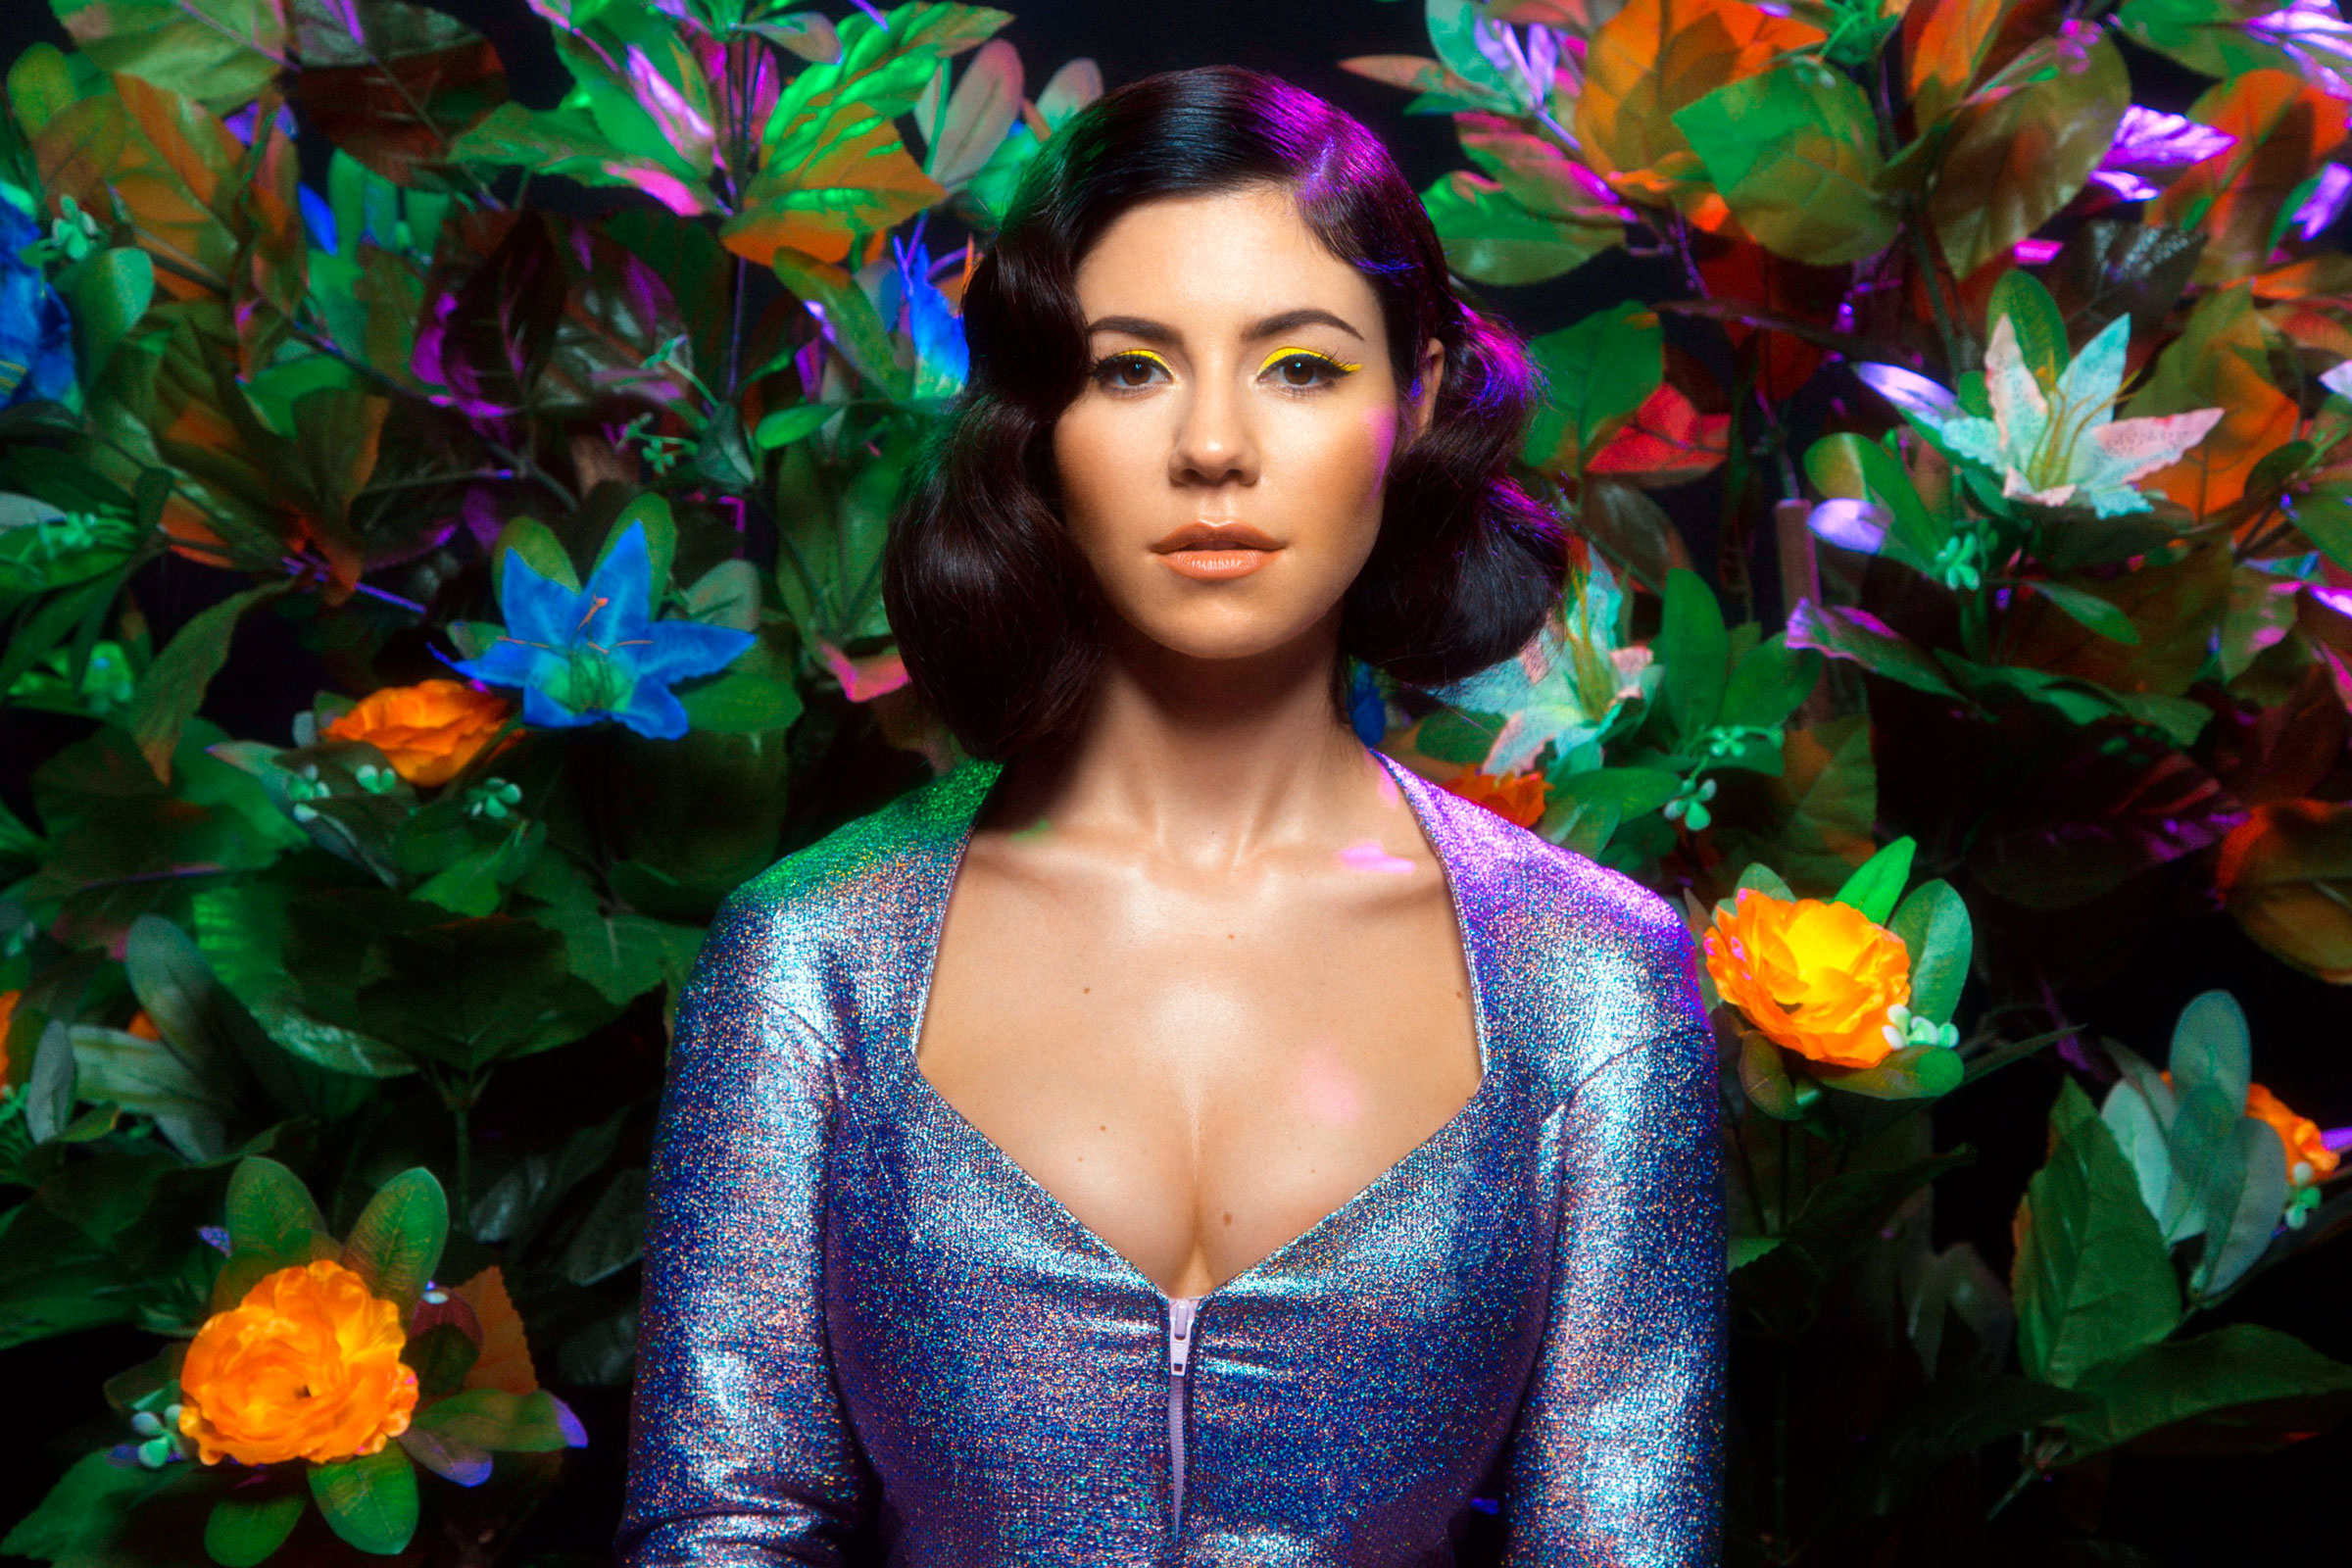 Marina, 'handmade Heaven' – Rolling Stone